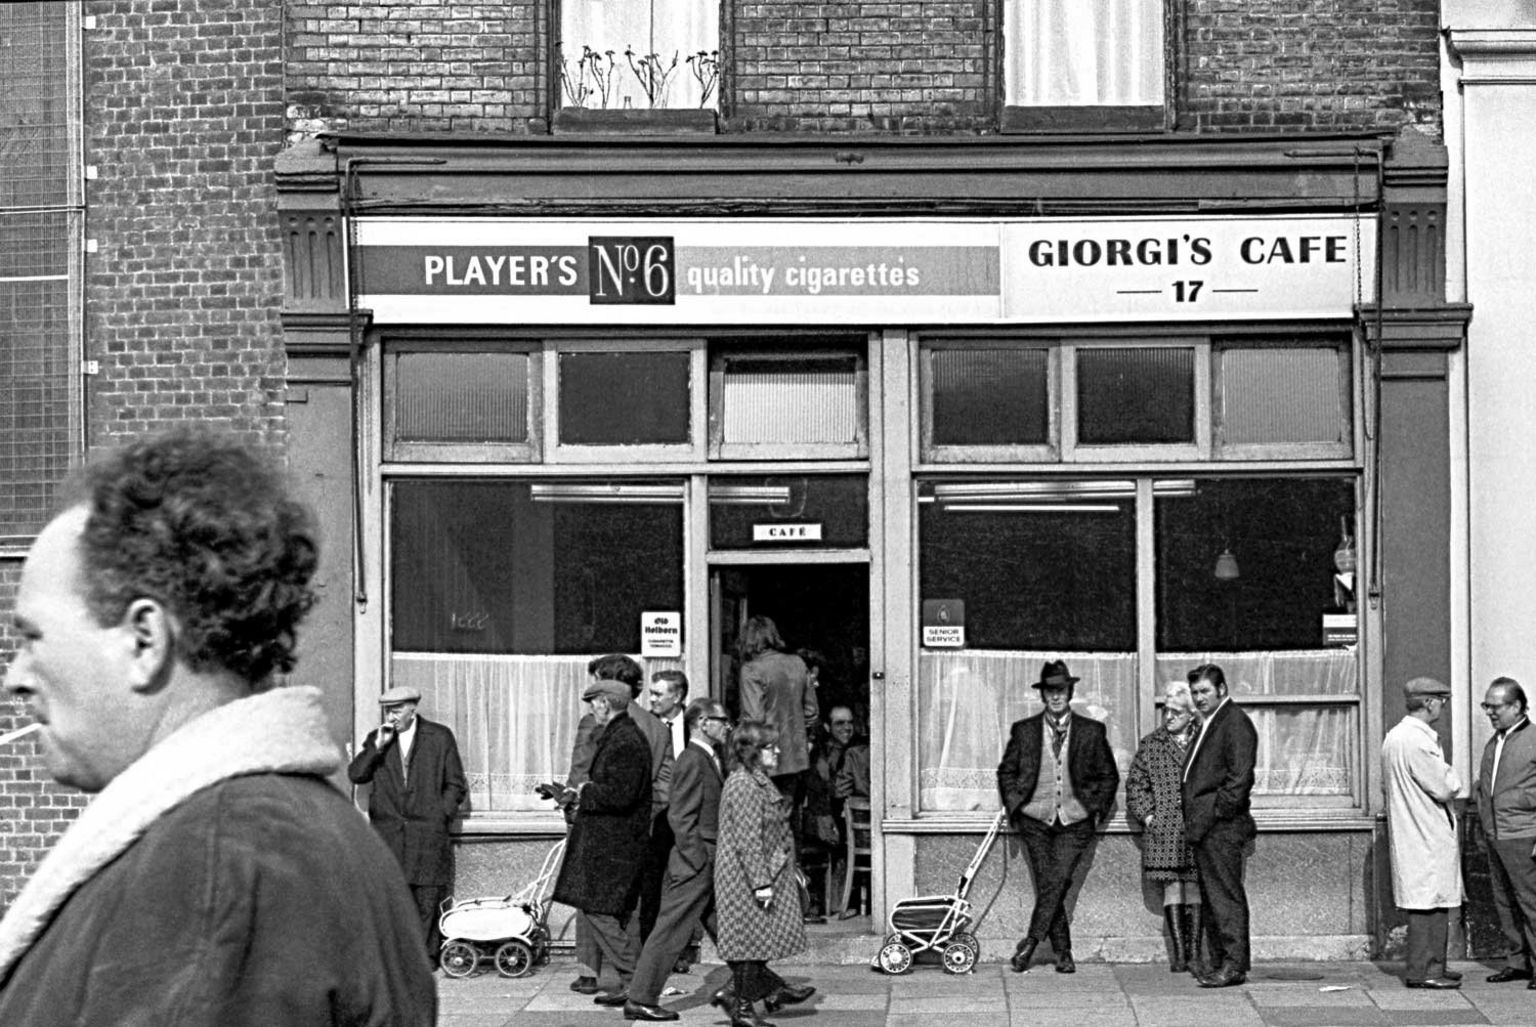 Giorgi's Cafe, Bethnal Green Road, 1971